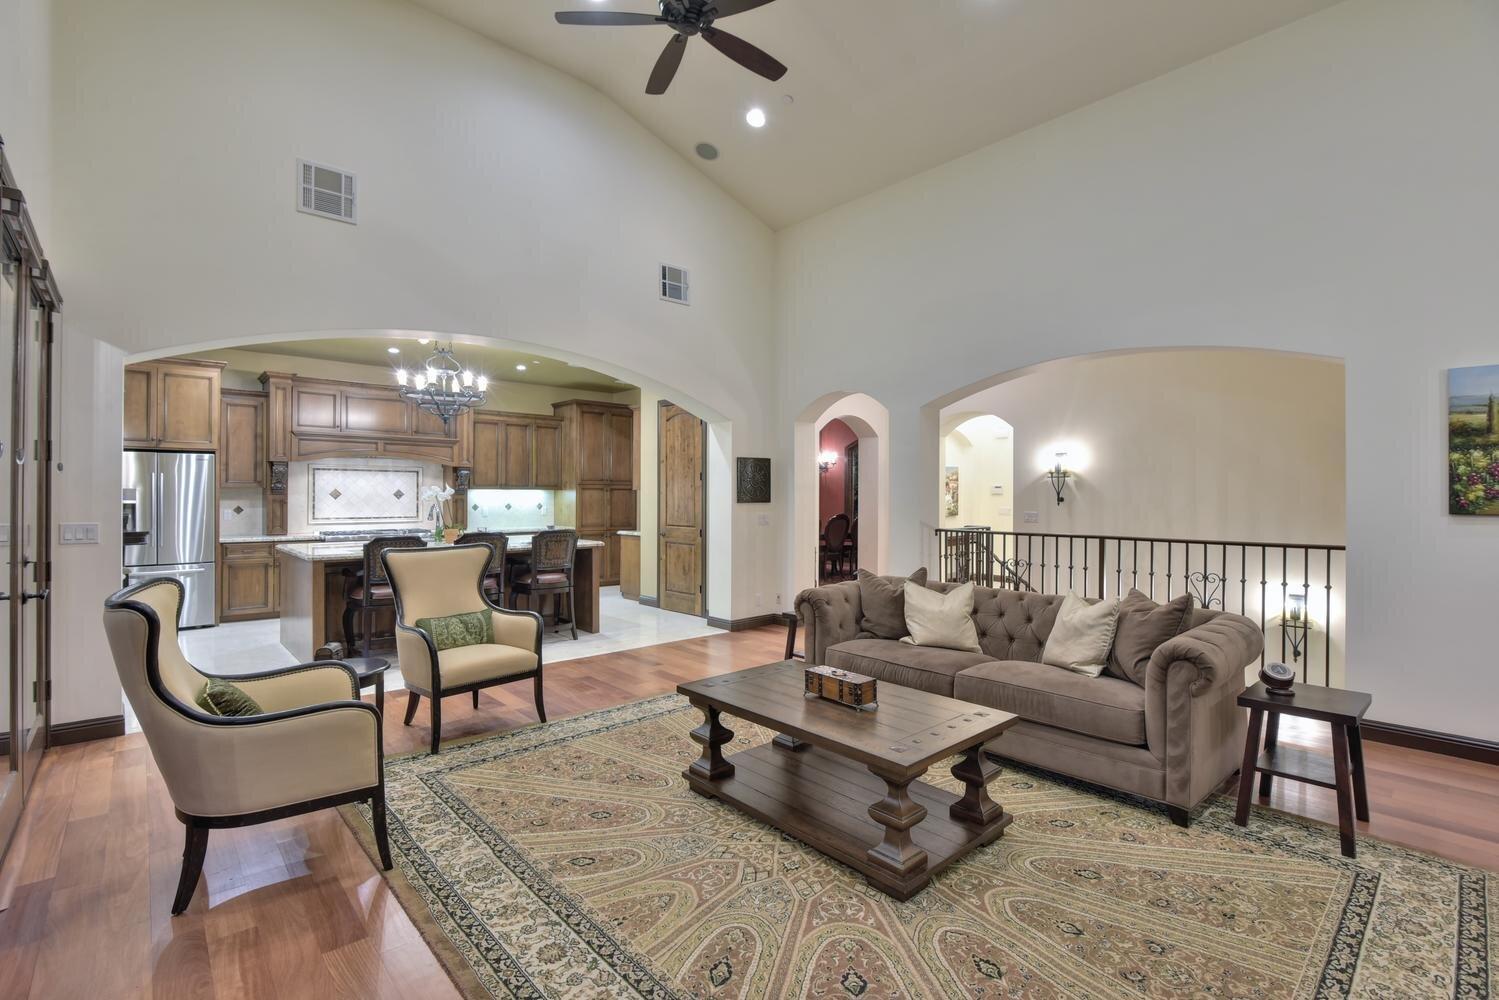 16021 Winterbrook Rd Los Gatos-large-015-008-Living Room View to Kitchen-1499x1000-72dpi.jpg